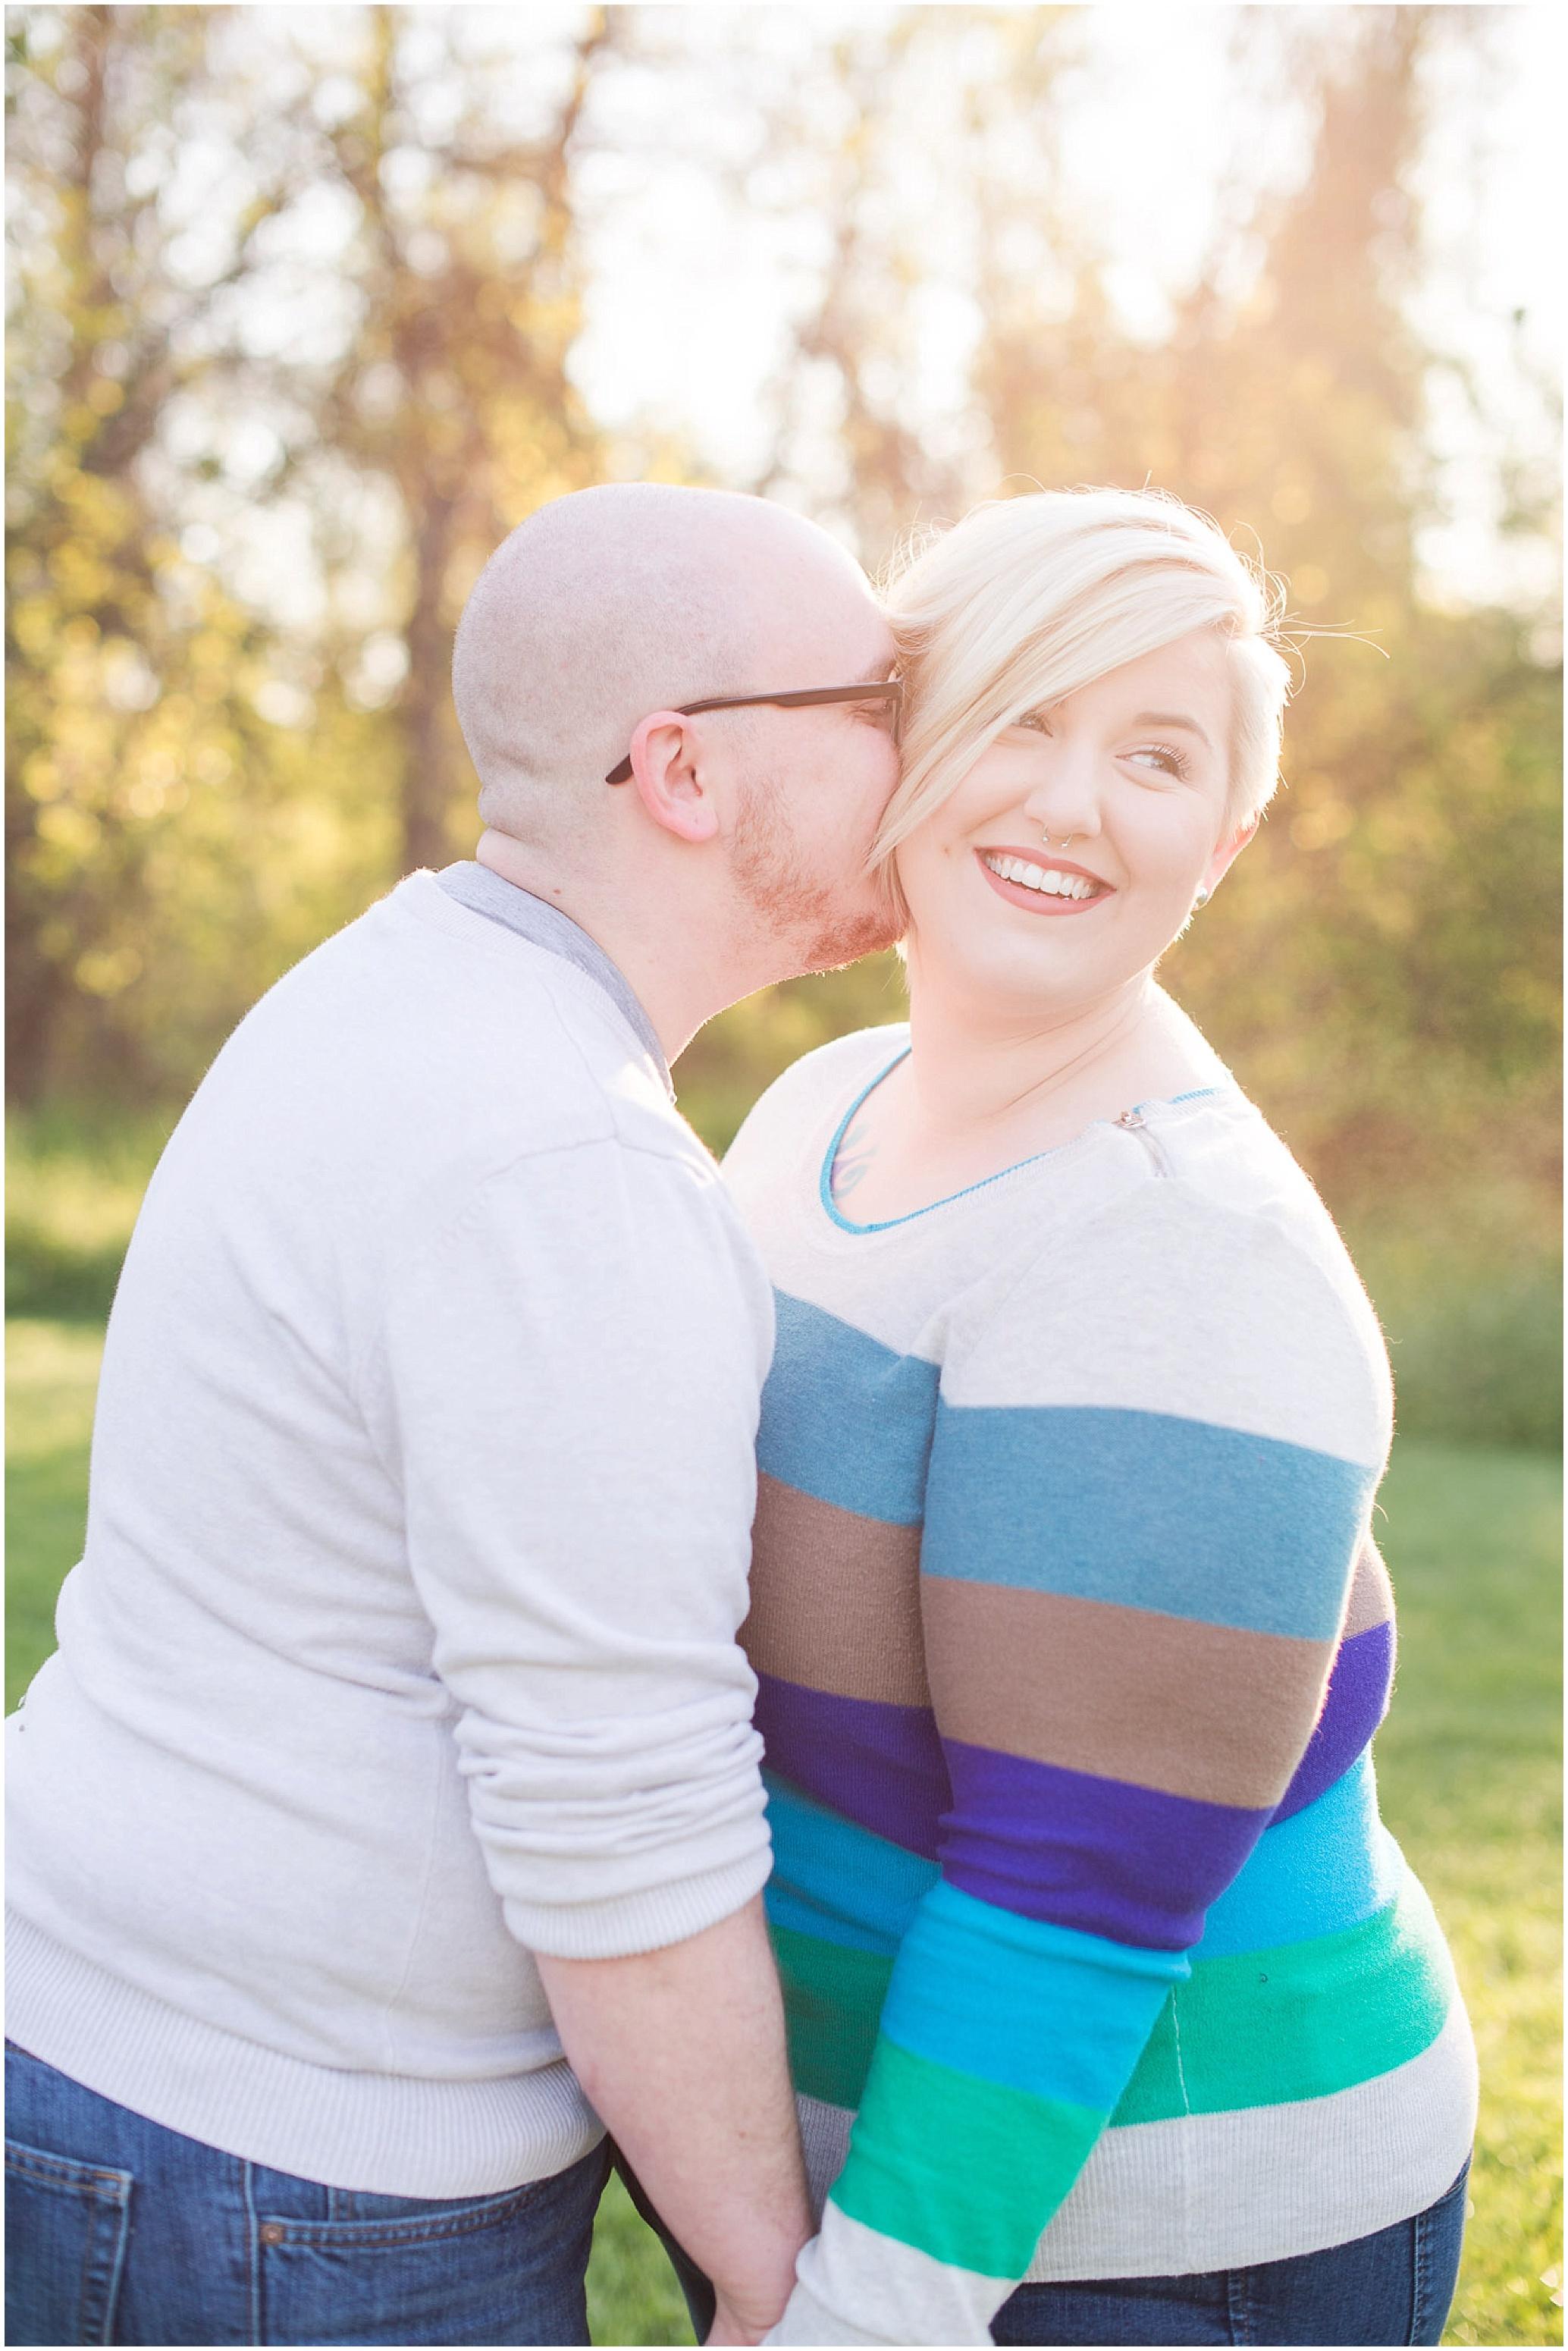 Hannah Leigh Photography Weddings and Engagements Baltimore Maryland_0018.jpg